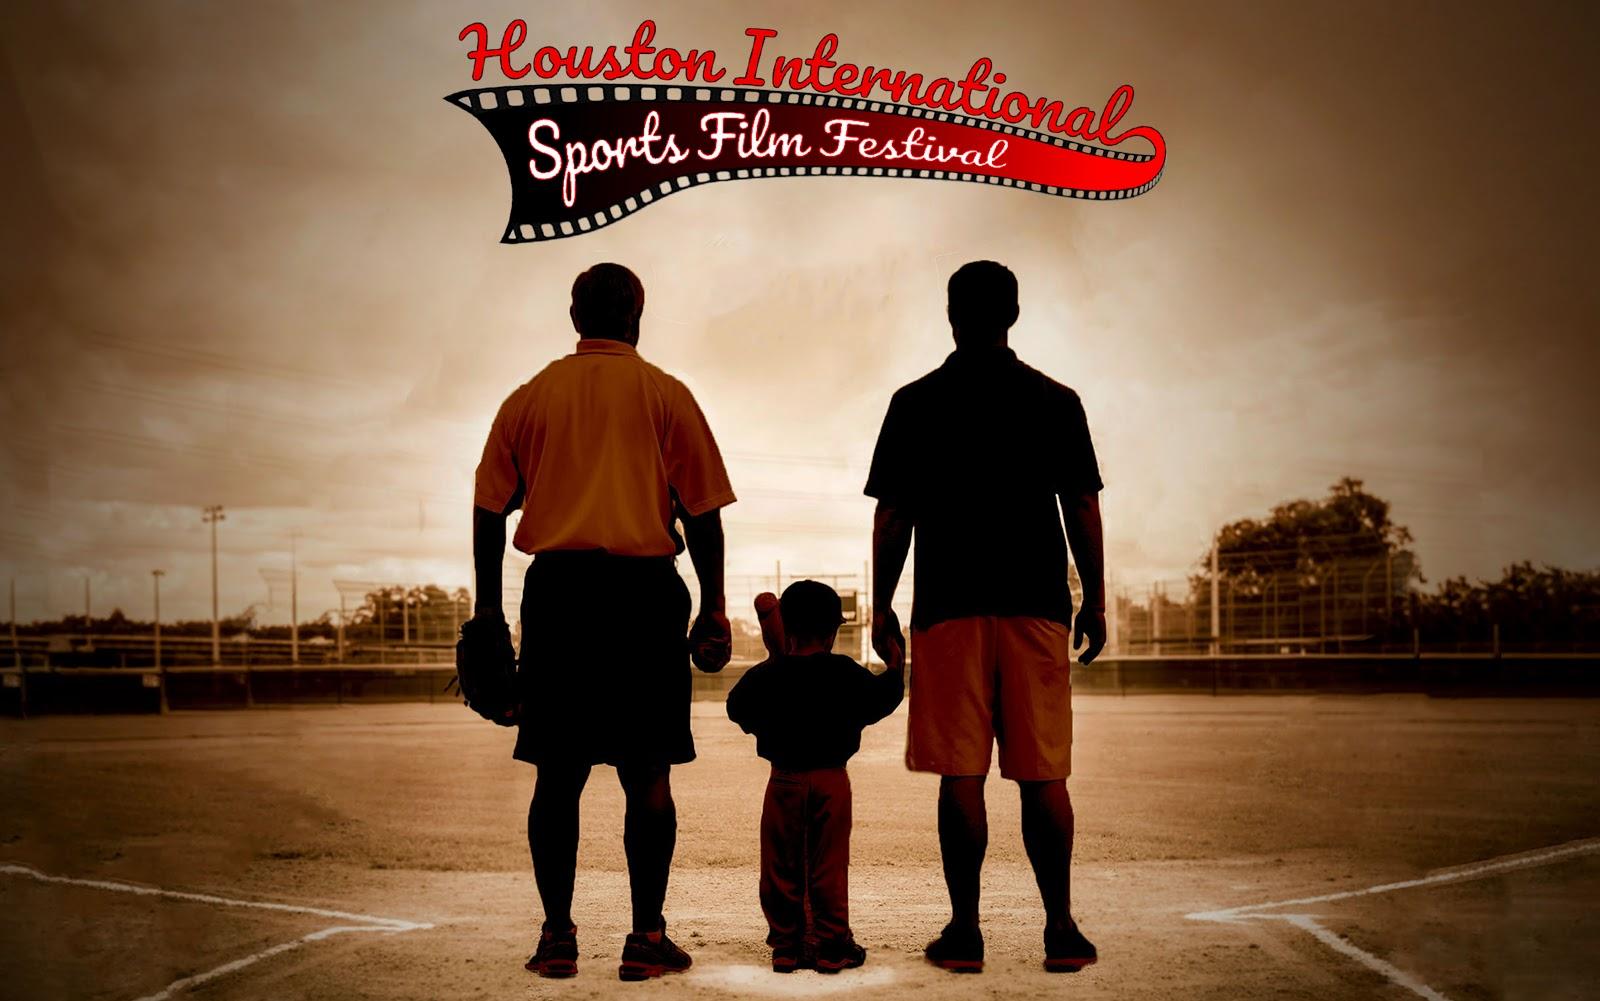 HoustonSportsFilmFestival